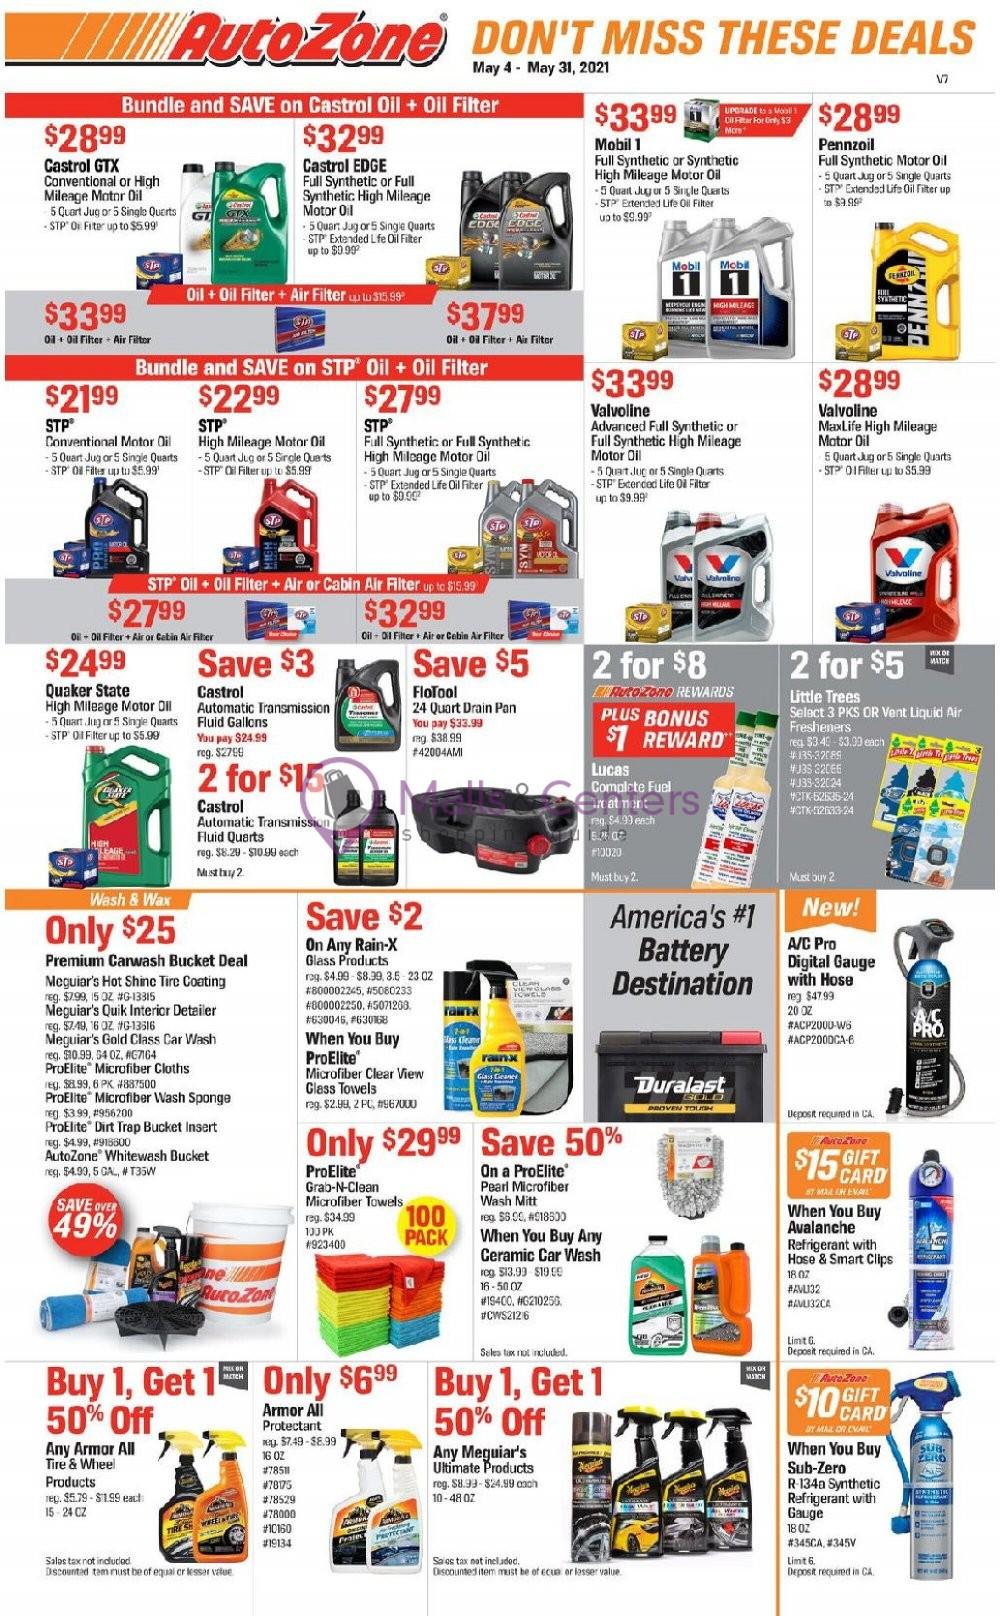 weekly ads AutoZone - page 1 - mallscenters.com